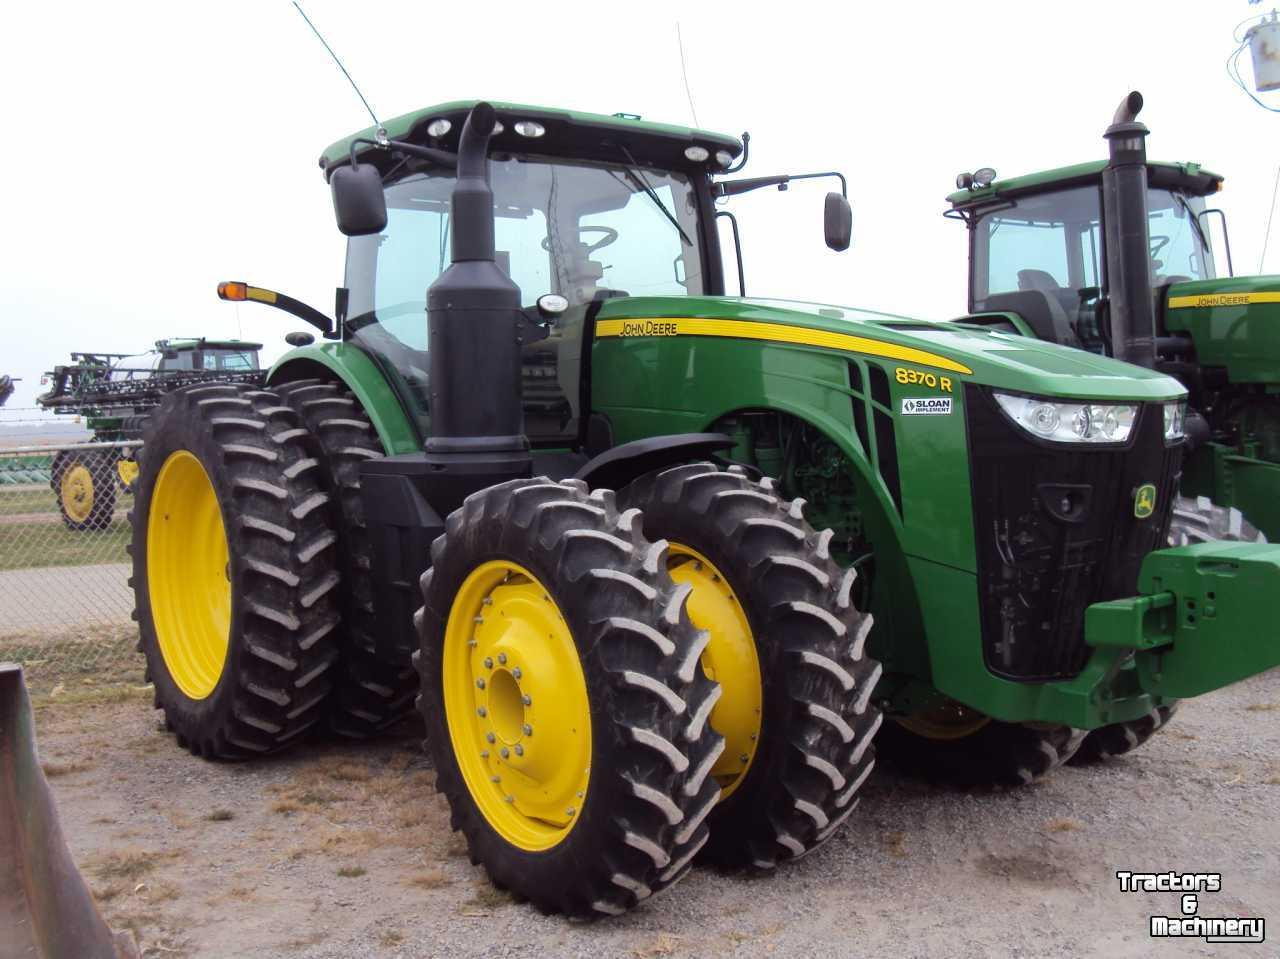 John Deere 8370R IVT TRACTOR - Used Tractors - 2014 - IL ...